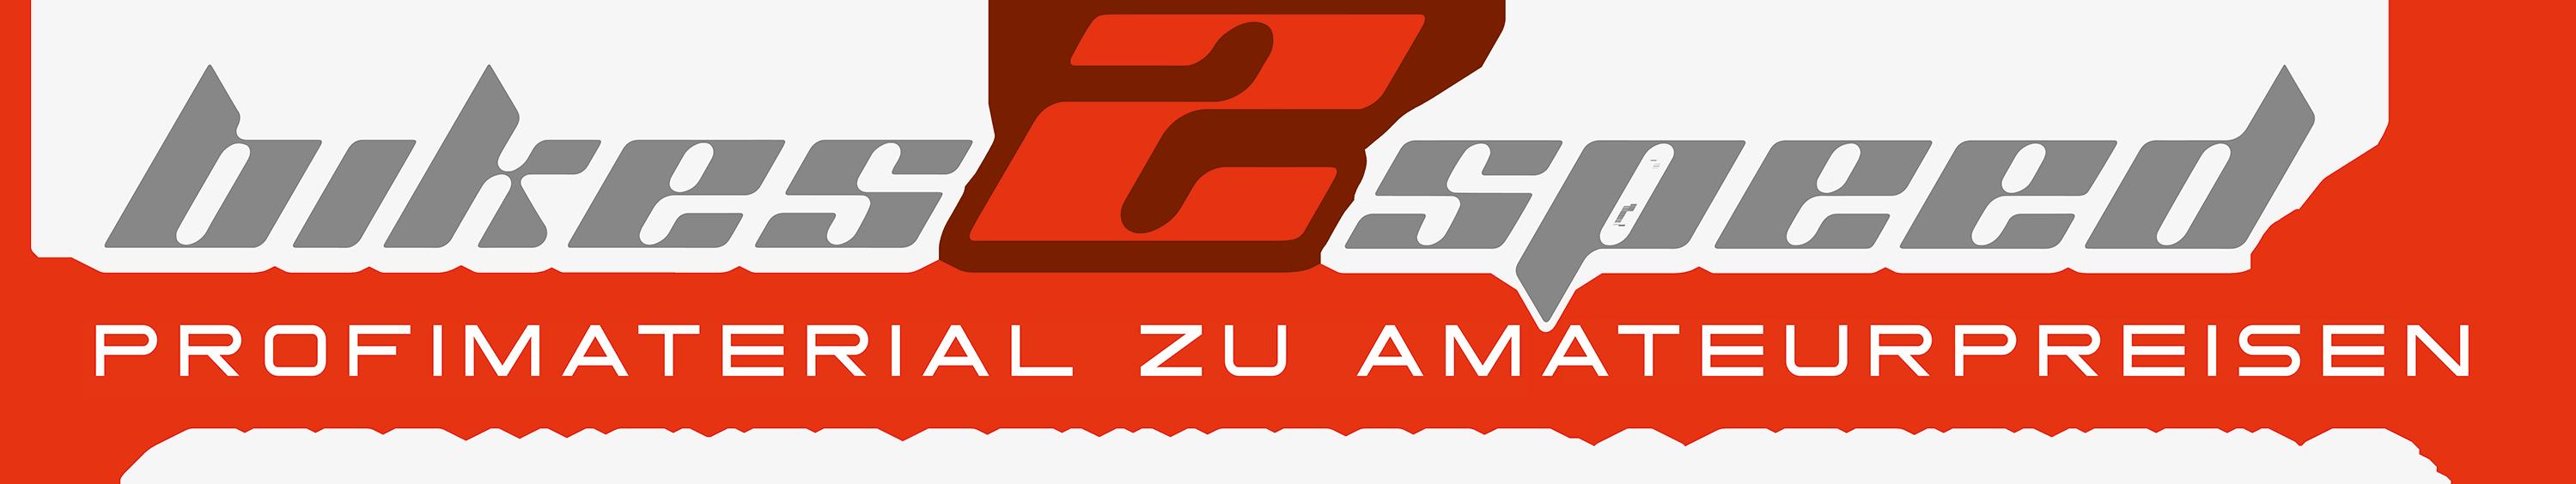 bikes2speed.com - Profimaterial zu Amateurpreisen